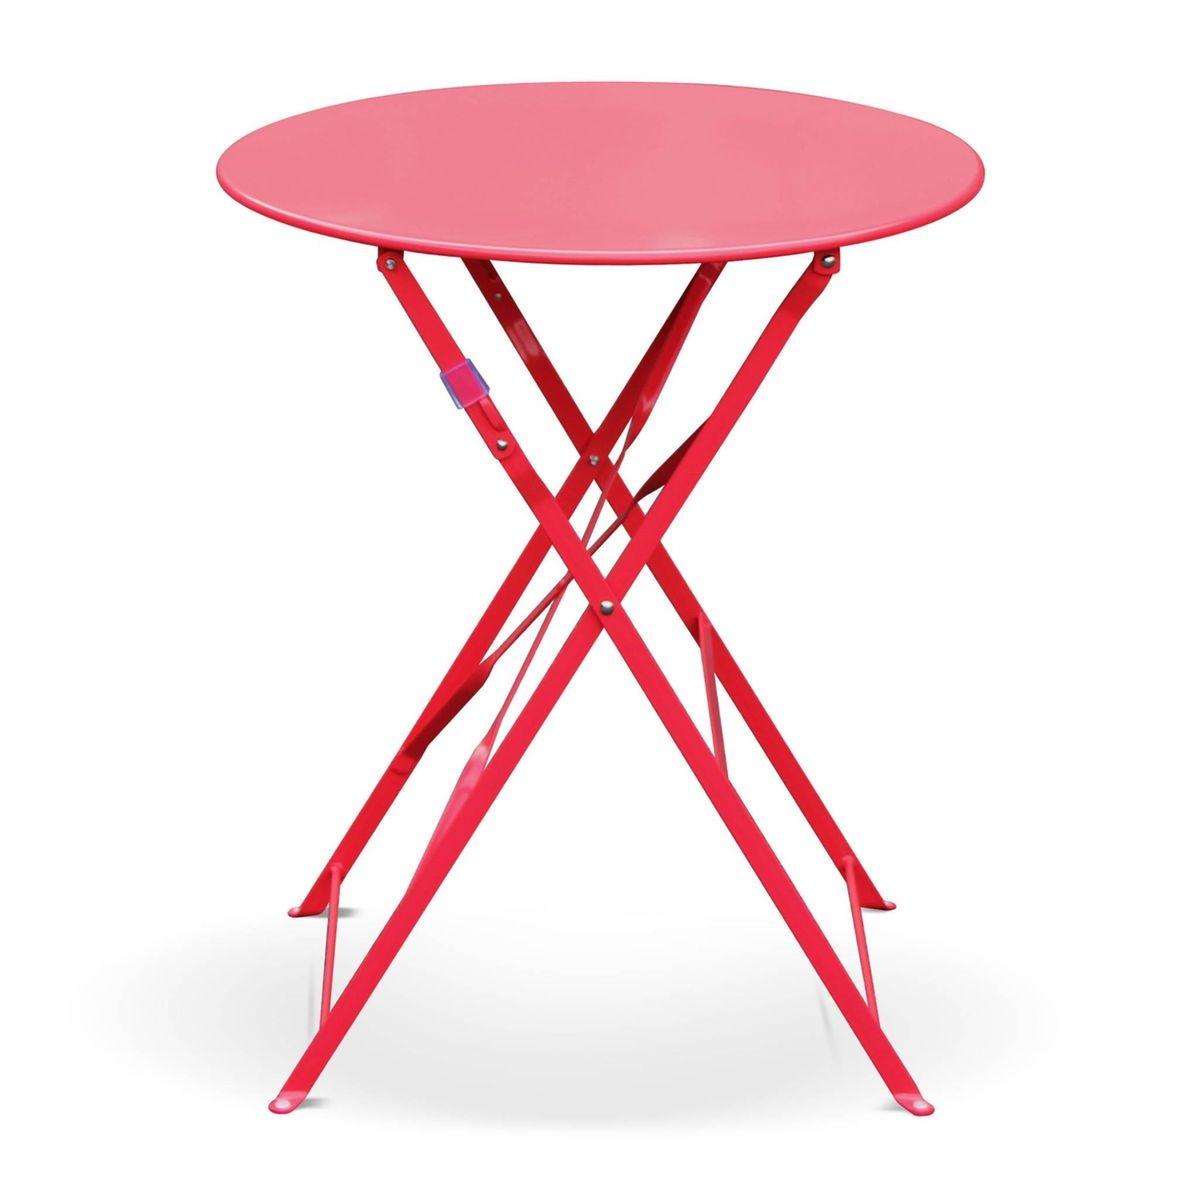 Table De Jardin Bistrot Pliable - Emilia Ronde Anthracite ...